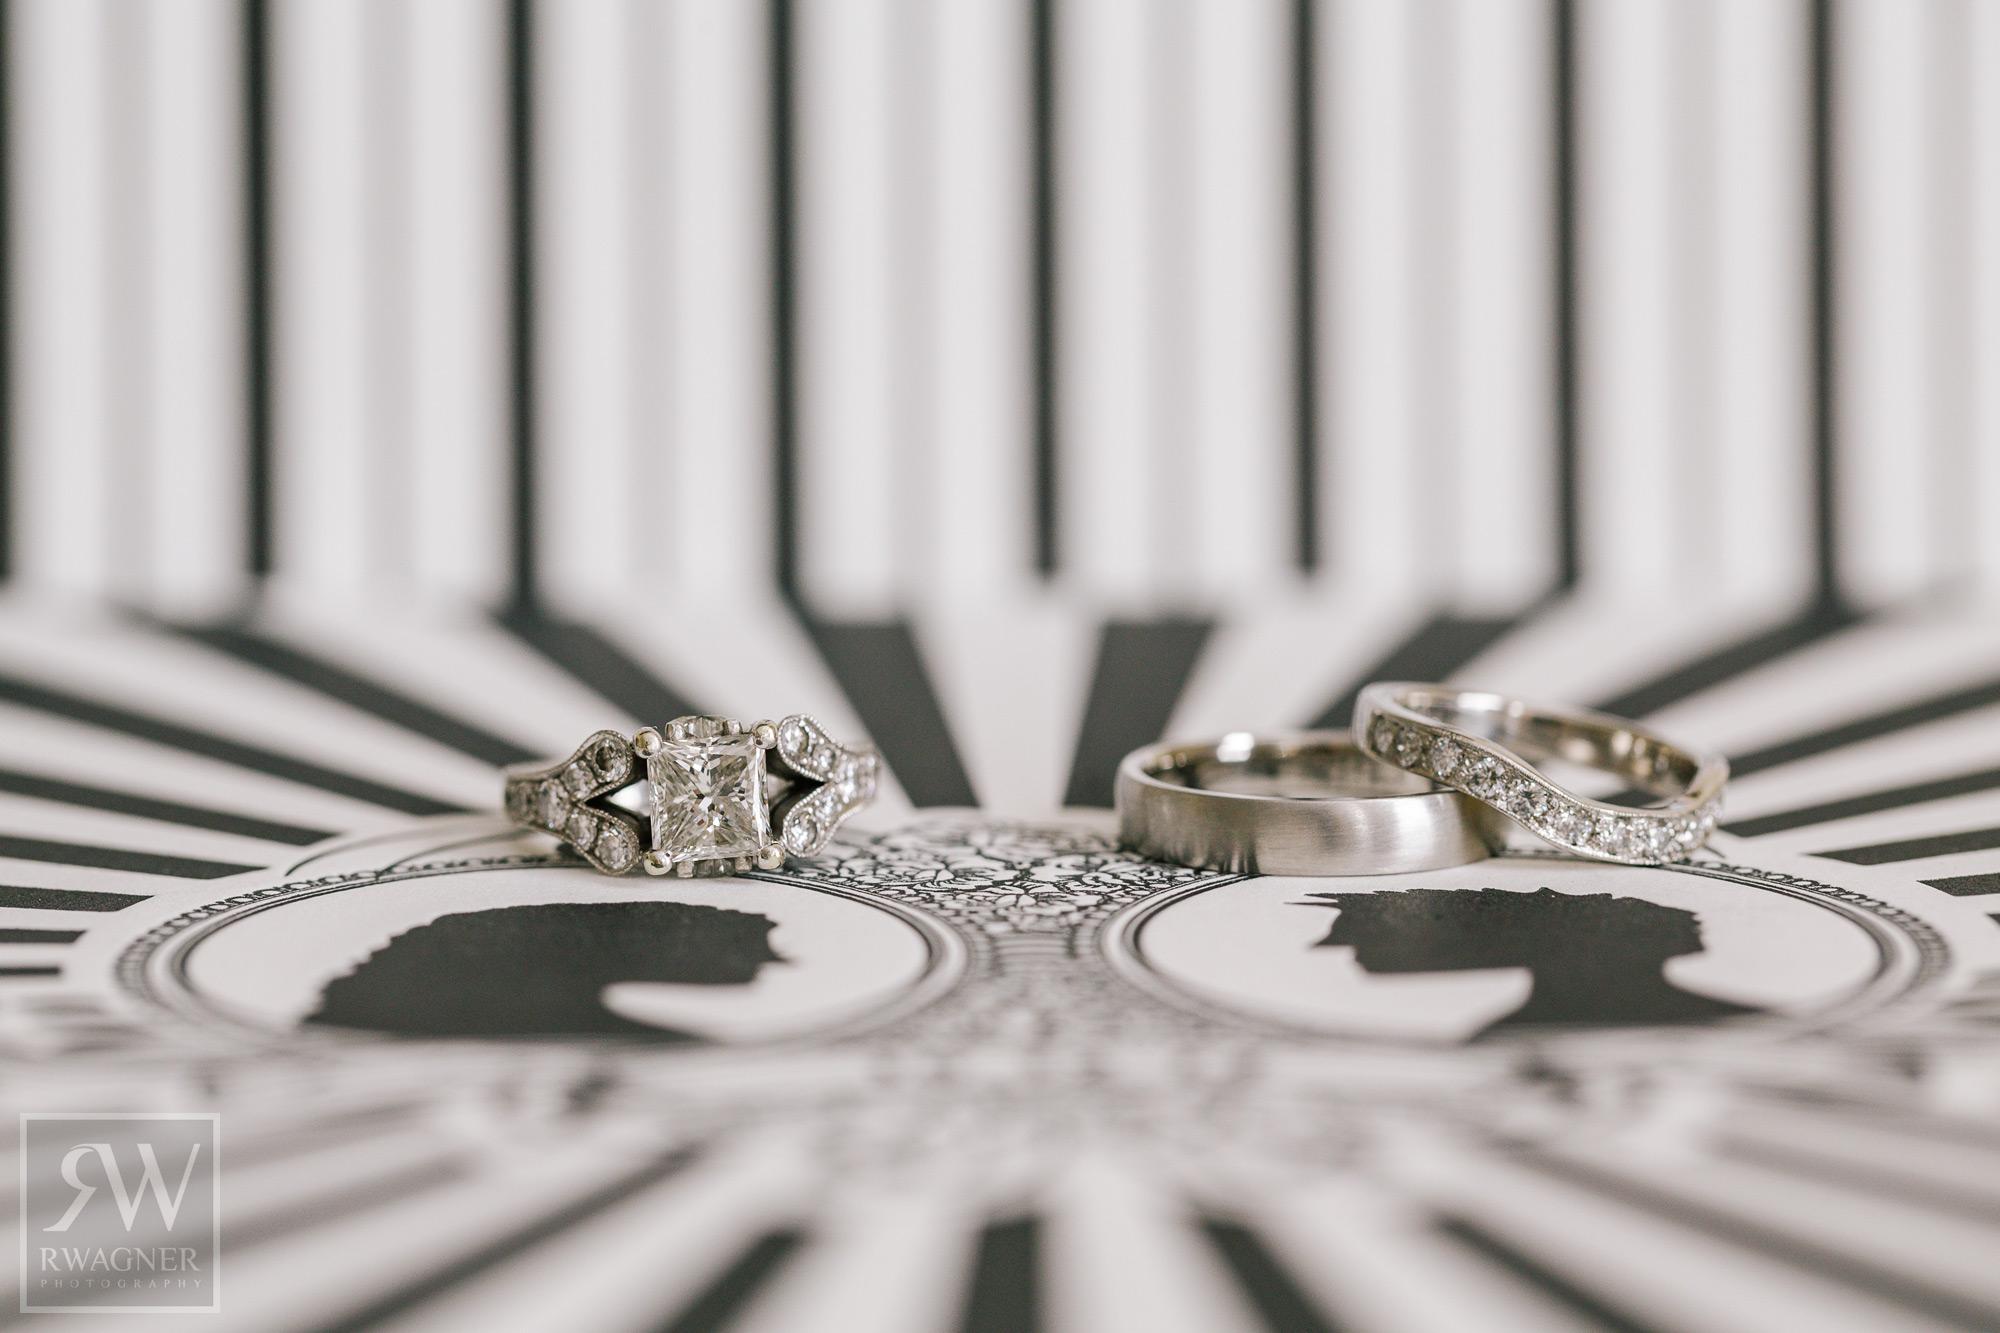 ceci_new_york_luxury_wedding_invitations_couture_red_black_white_real_wedding_dramatic_inn_at_longshore_v286_3.jpg